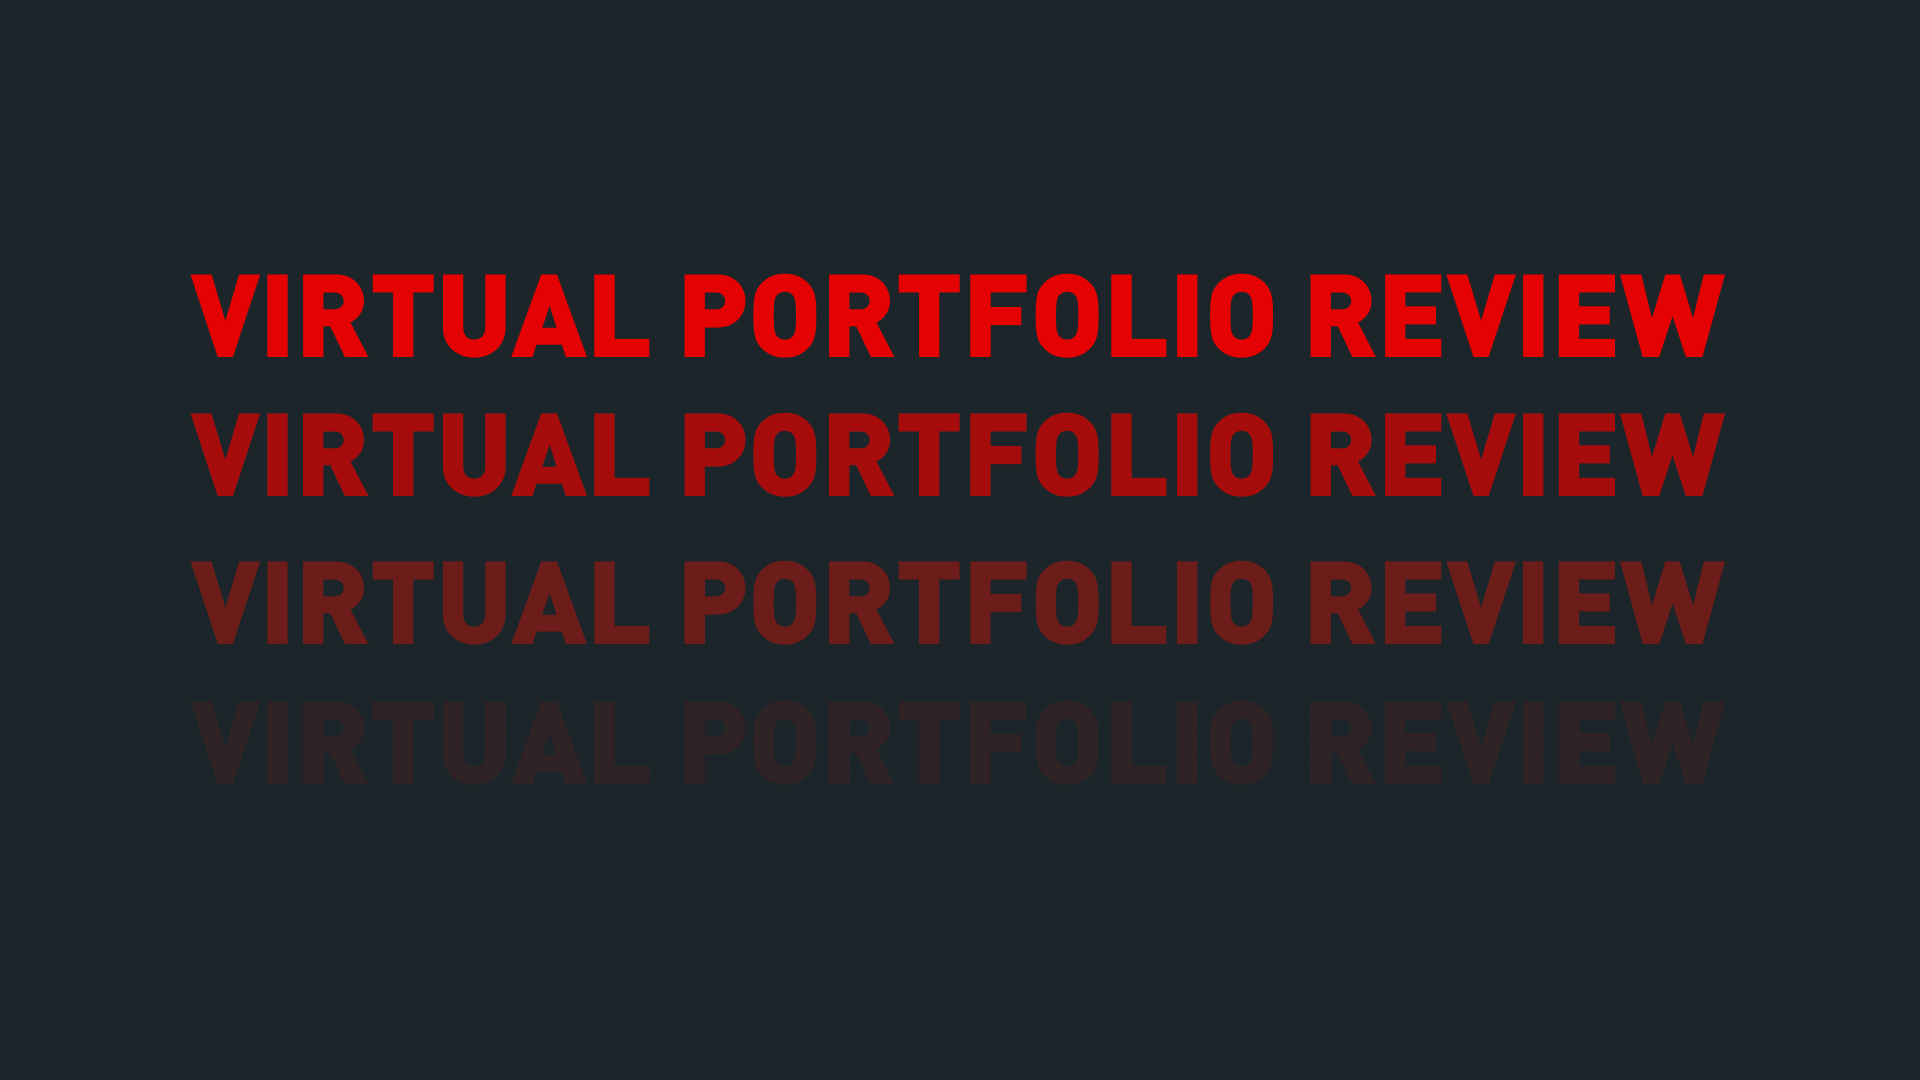 Virtual Portfolio Review